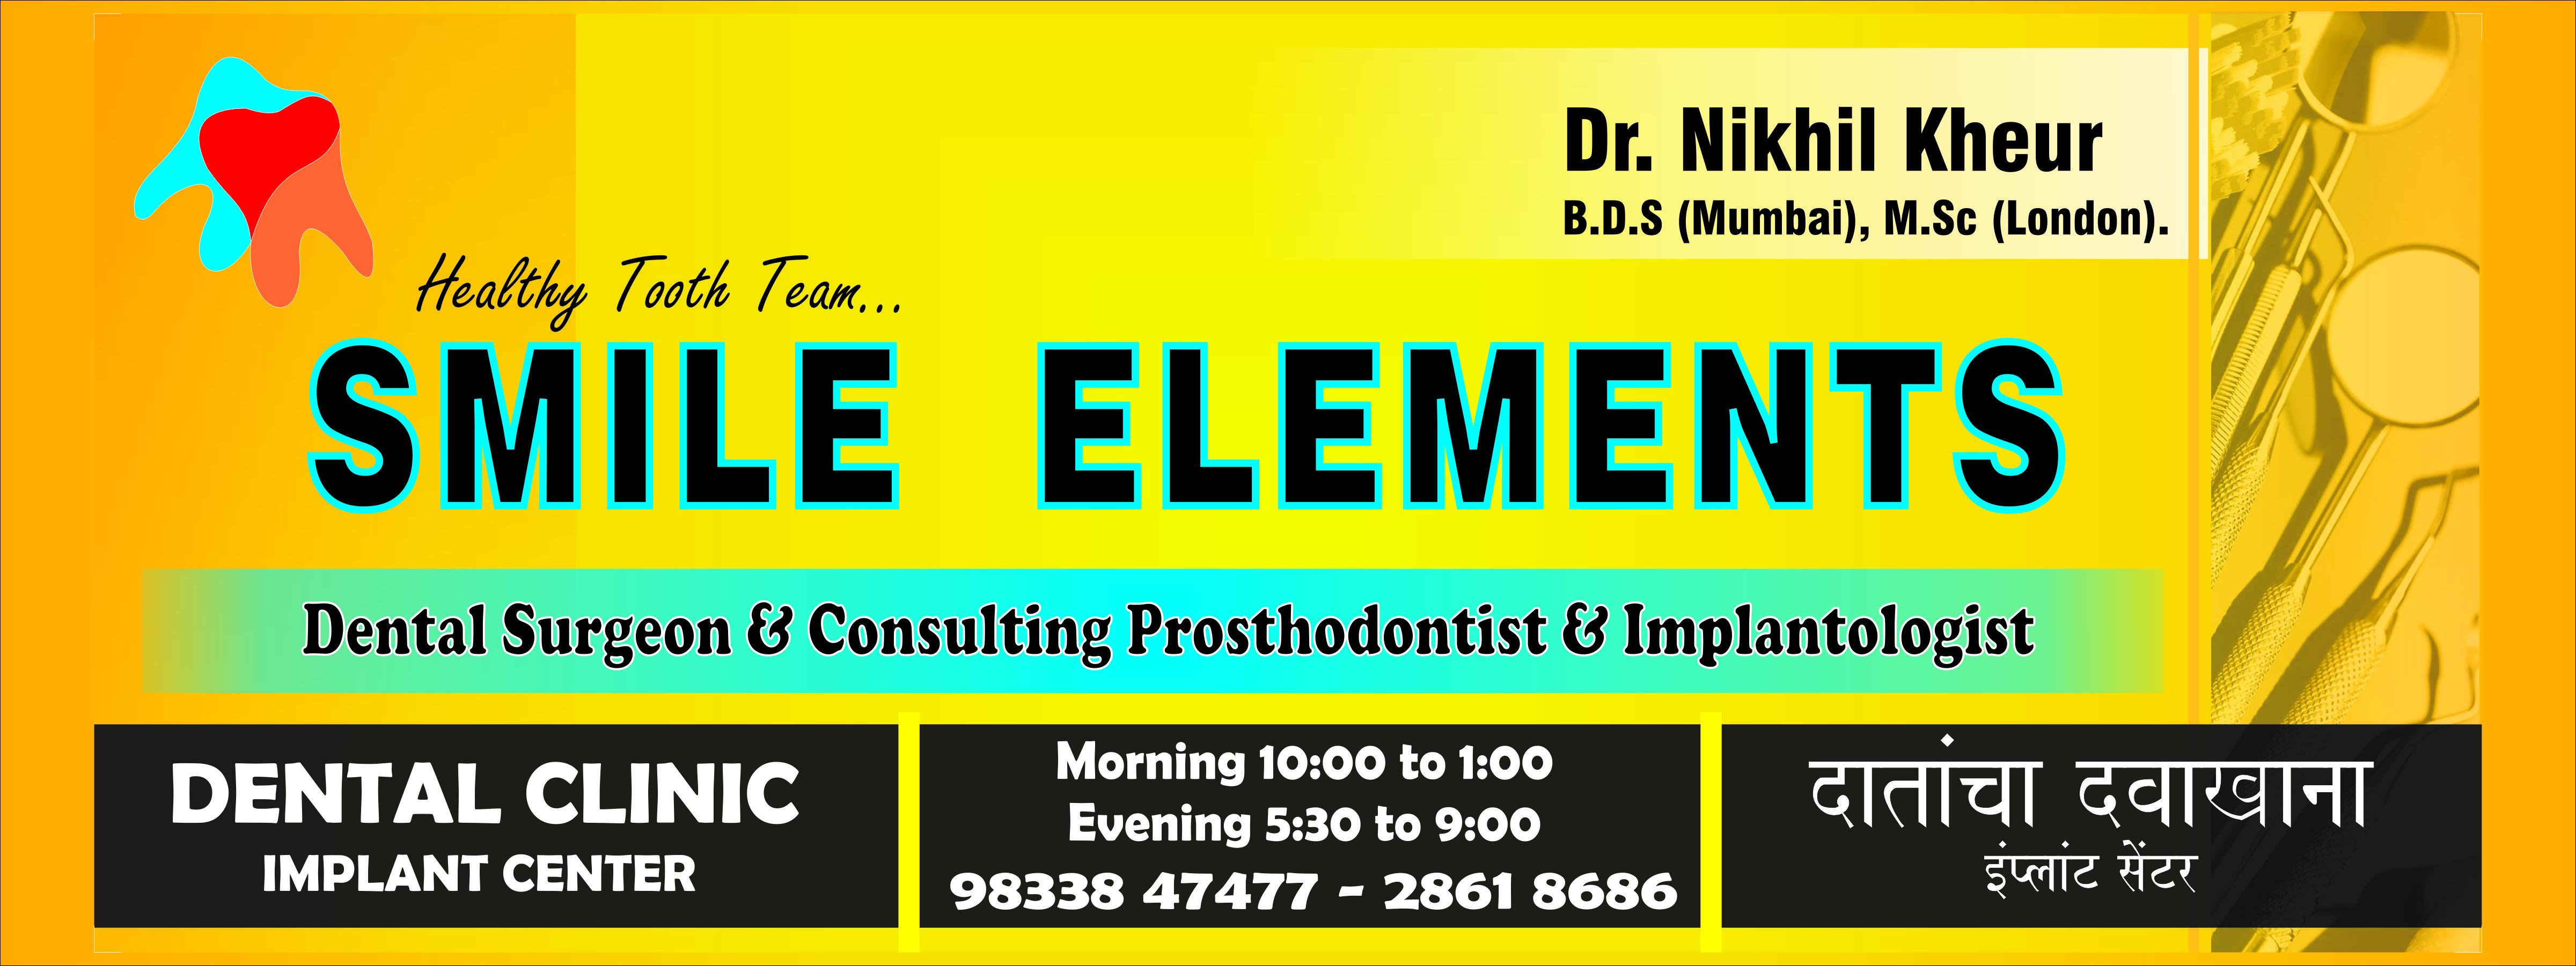 Smile Elements